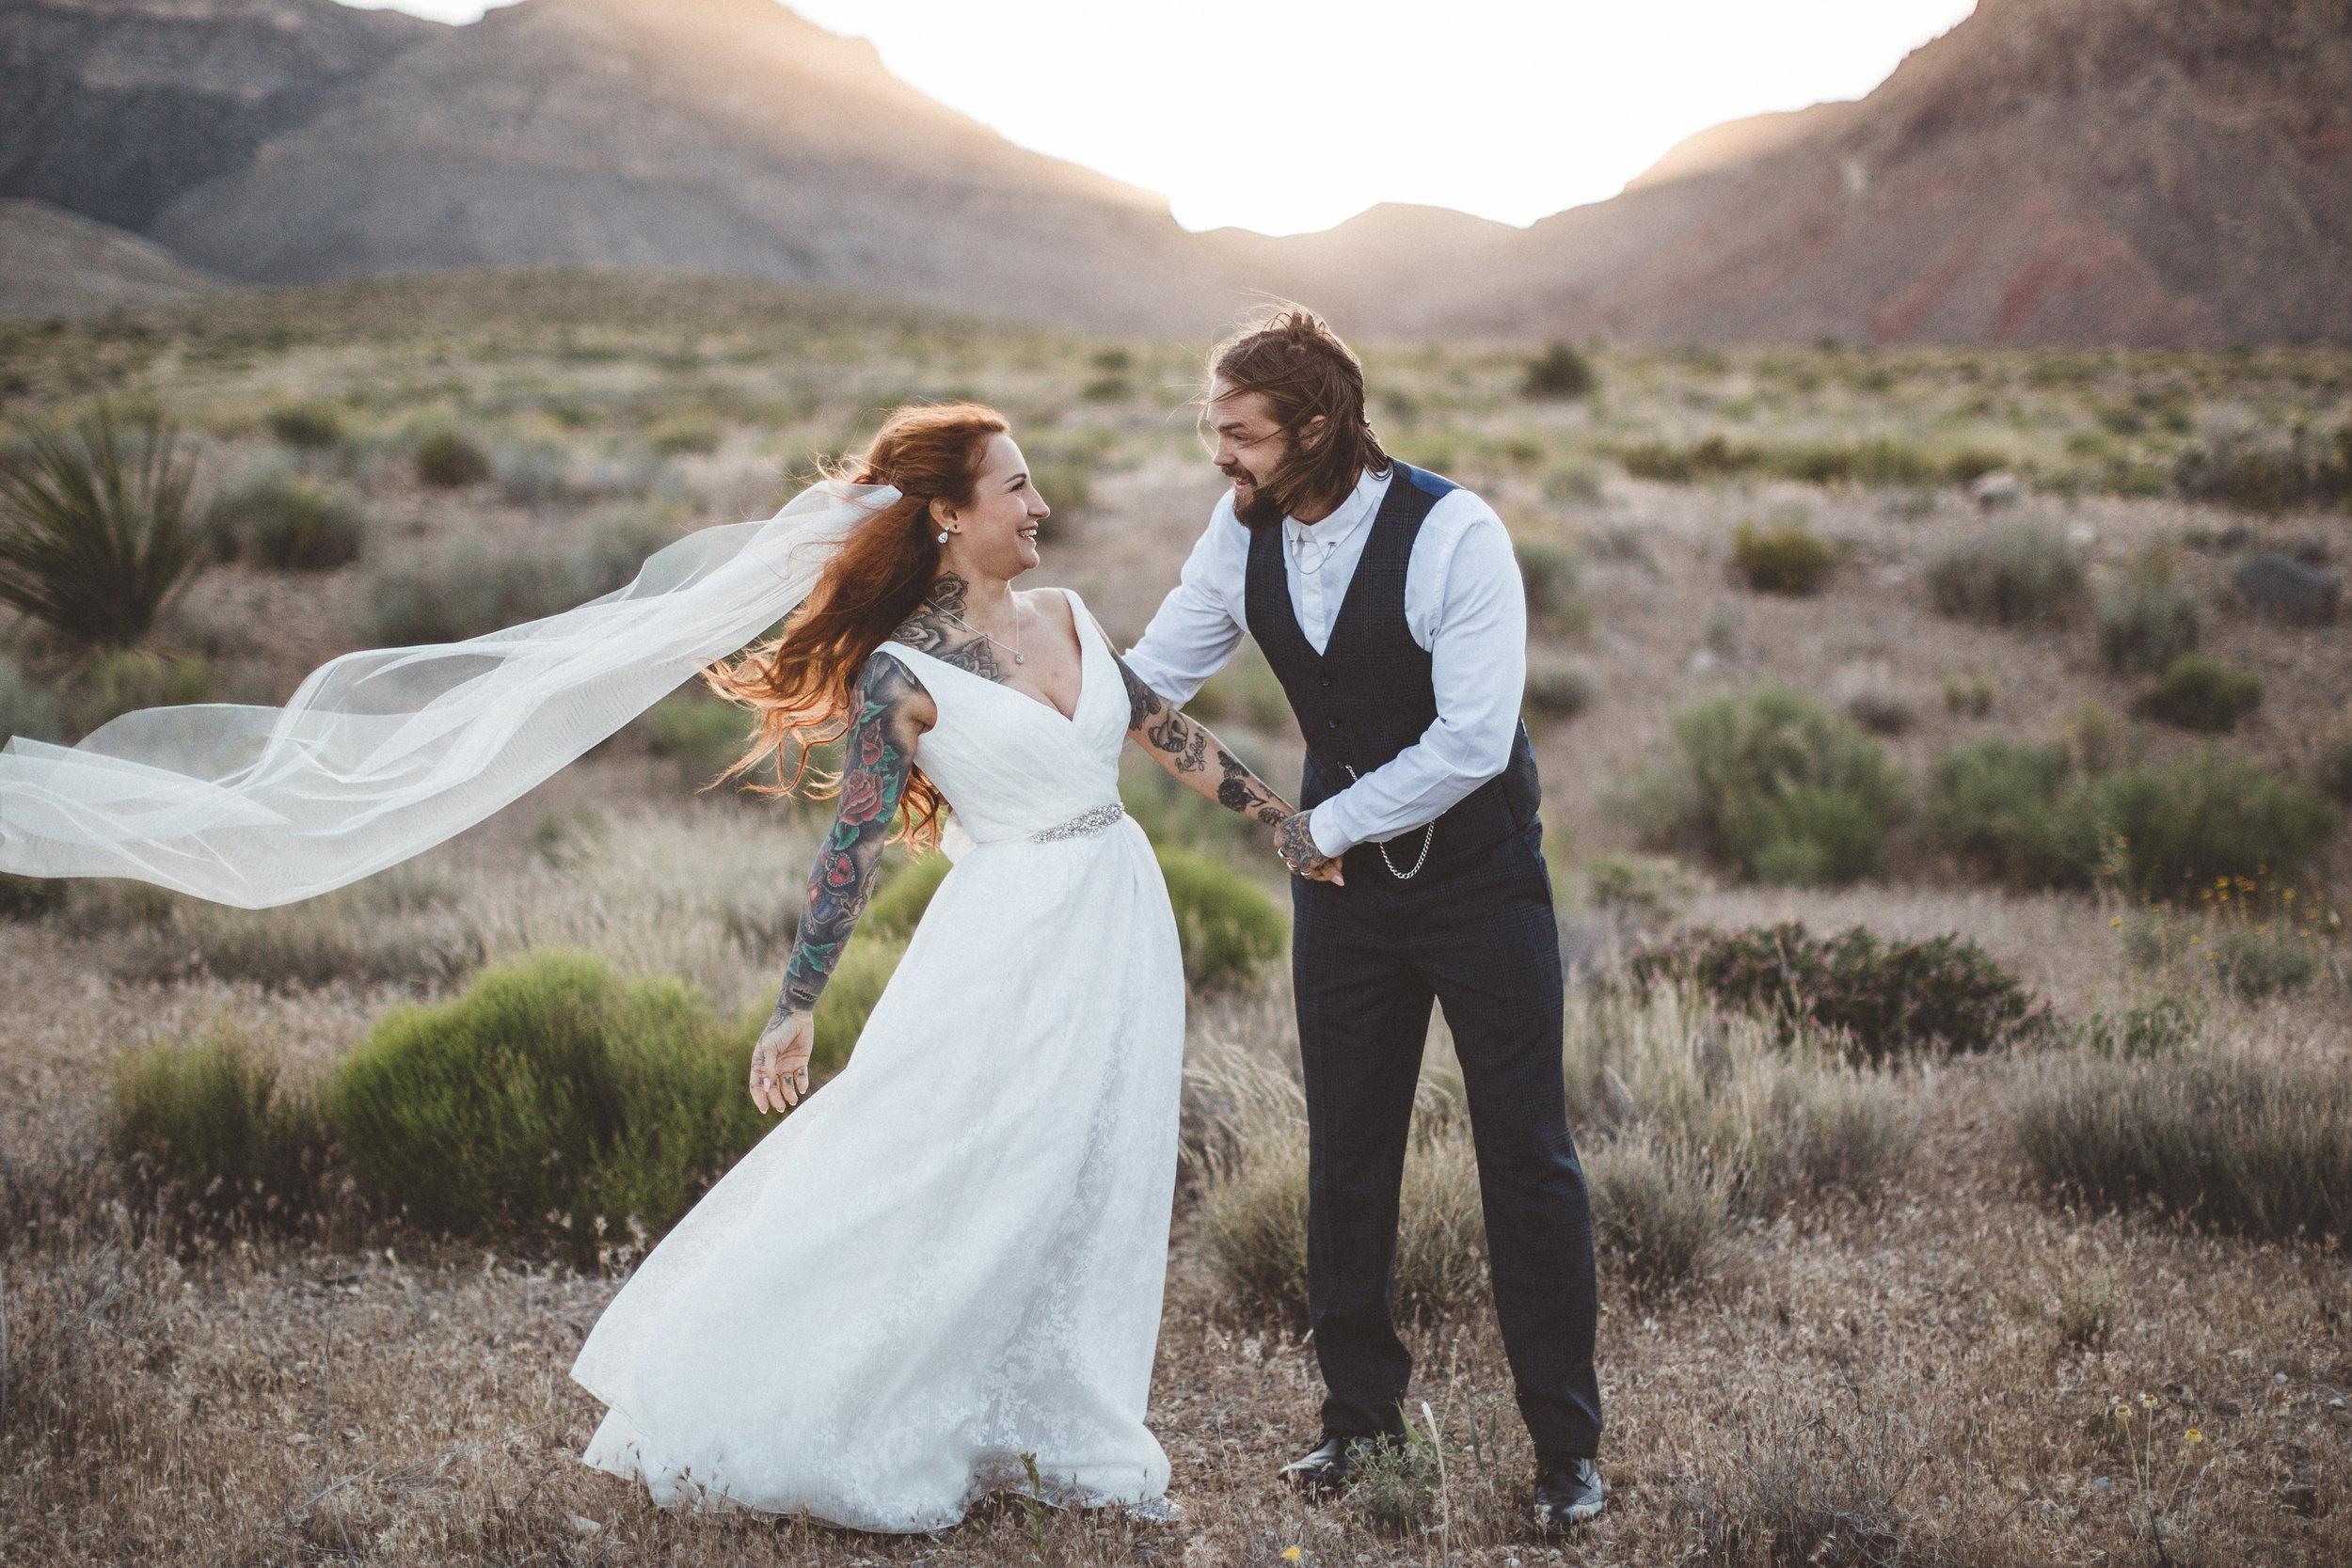 nicoletta-and-adams-rad-las-vegas-desert-elopement21.jpg